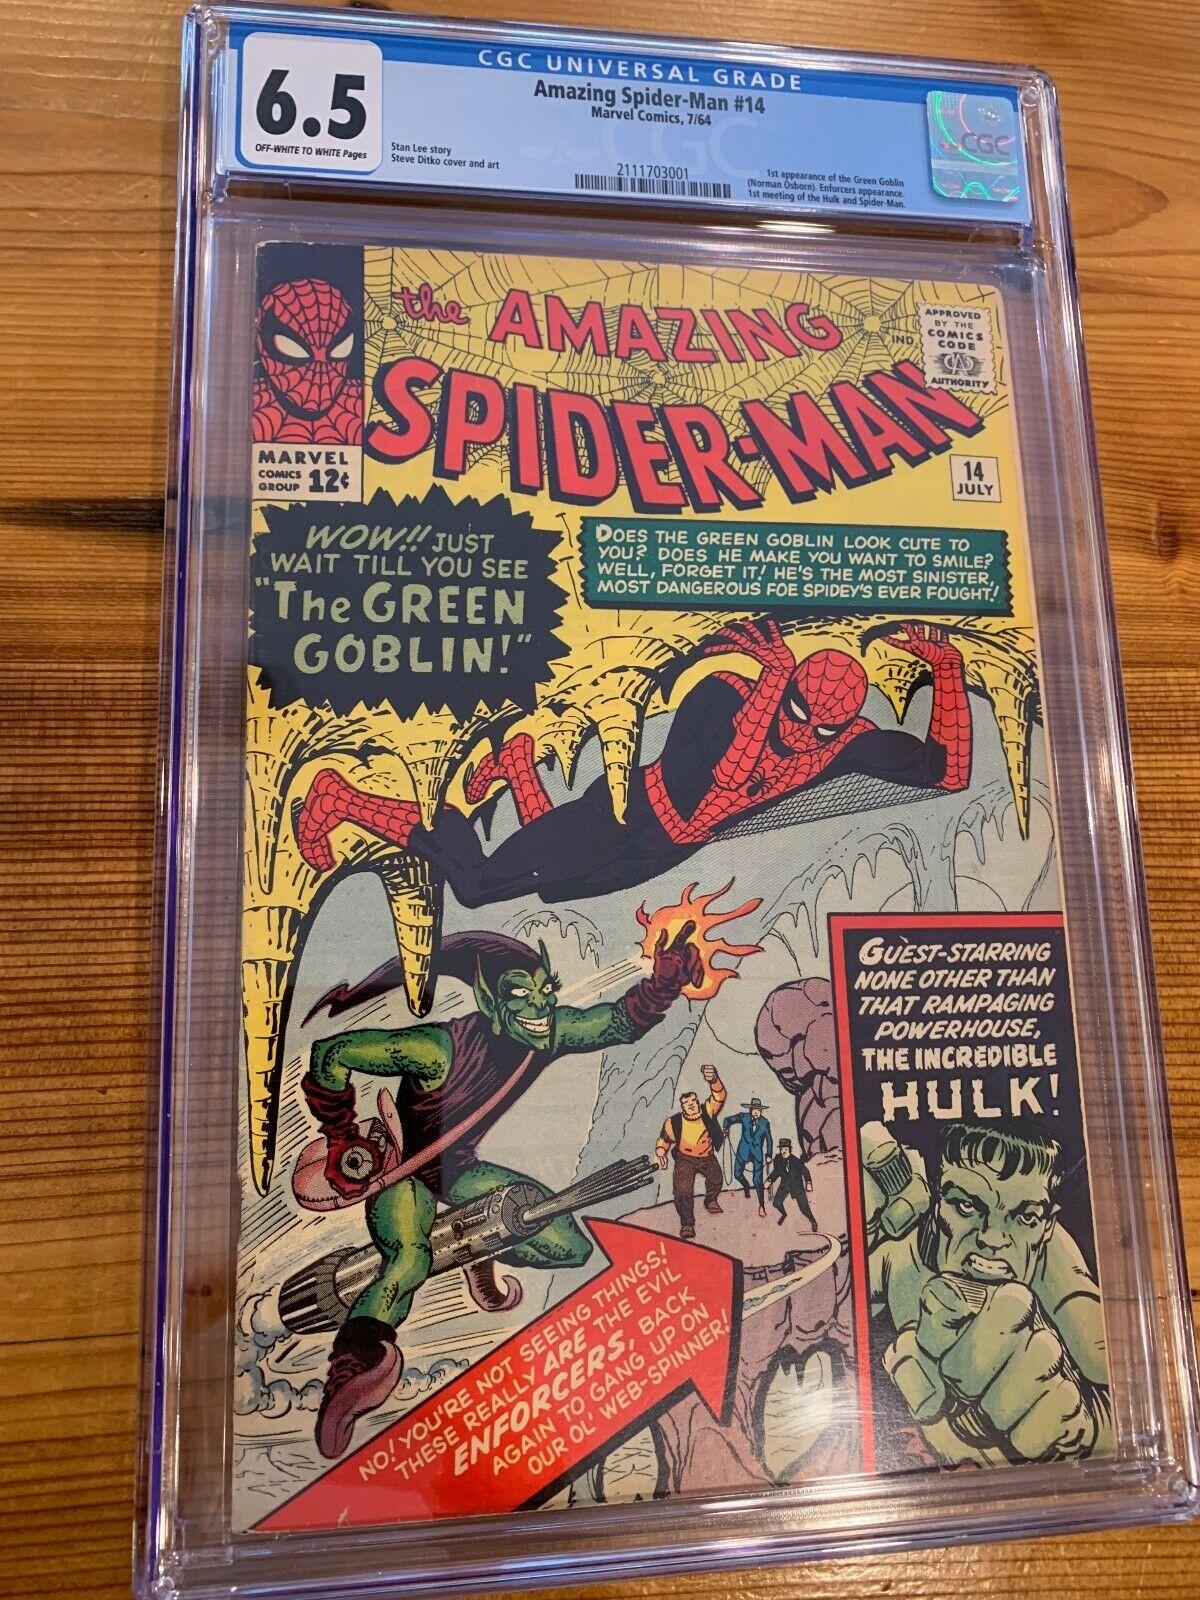 The Amazing SpiderMan 14 CGC Universal Grade 65 1st AppGreen Goblin